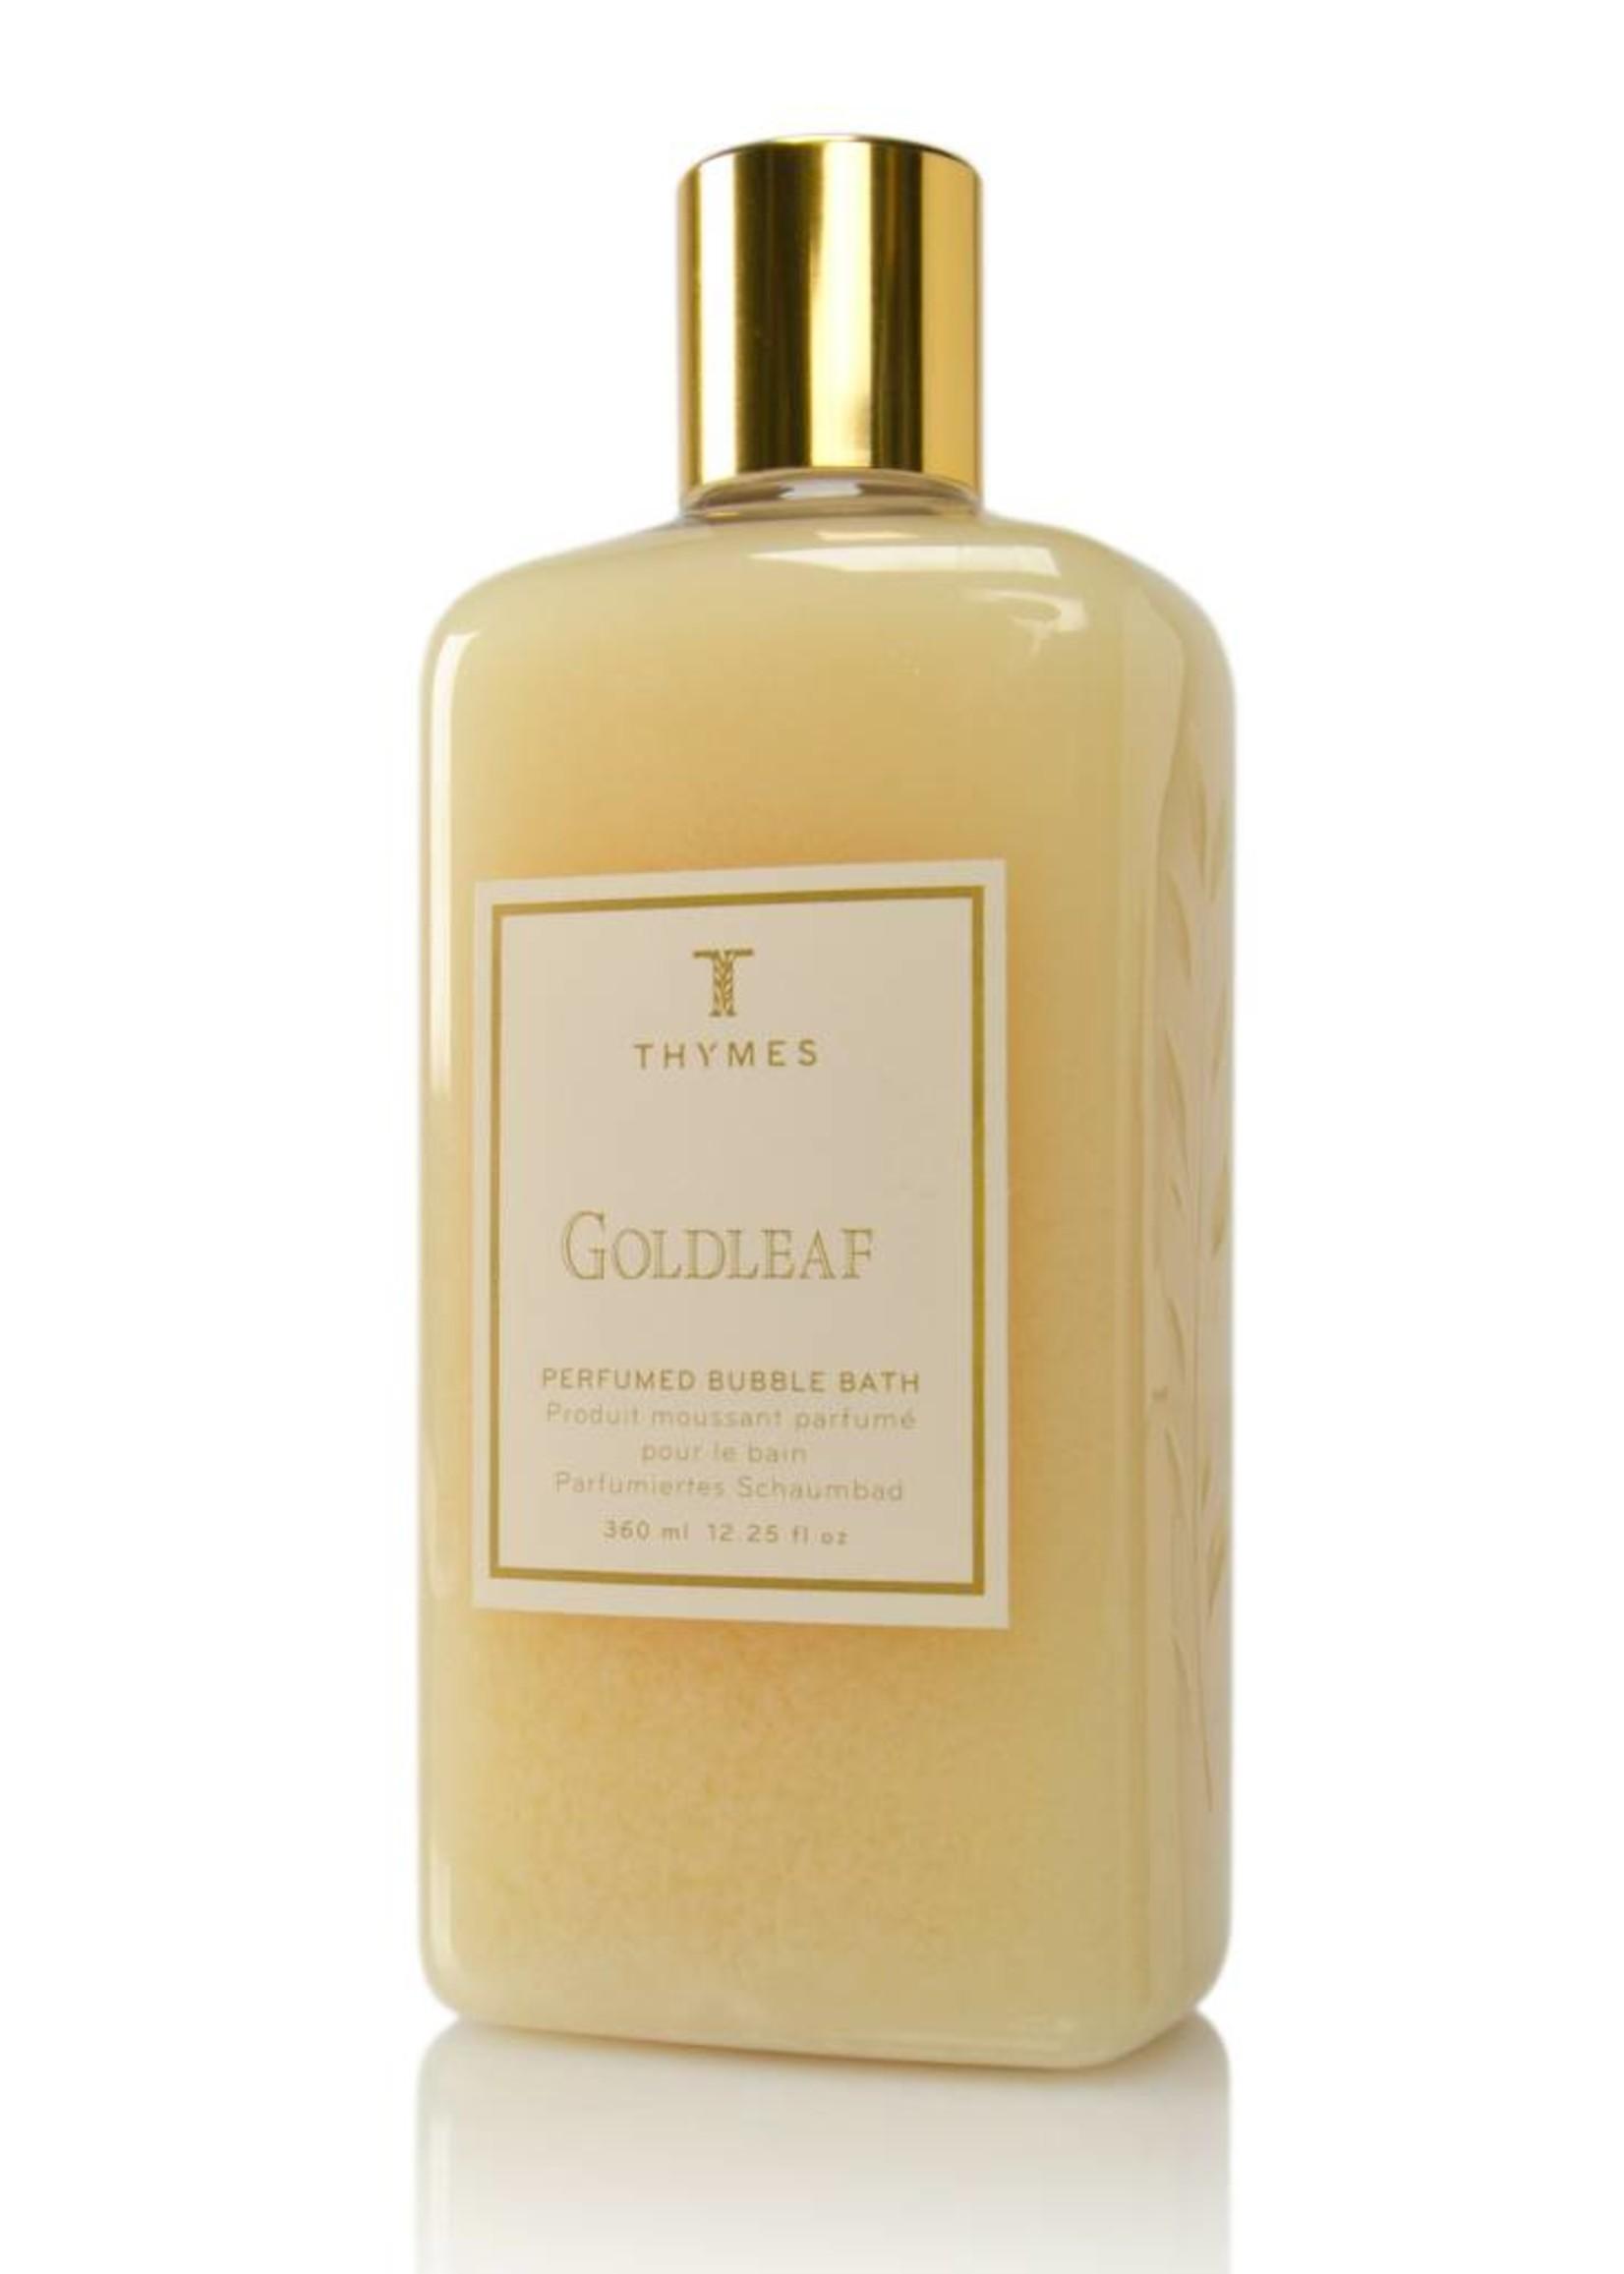 Thymes Goldleaf Bubble Bath